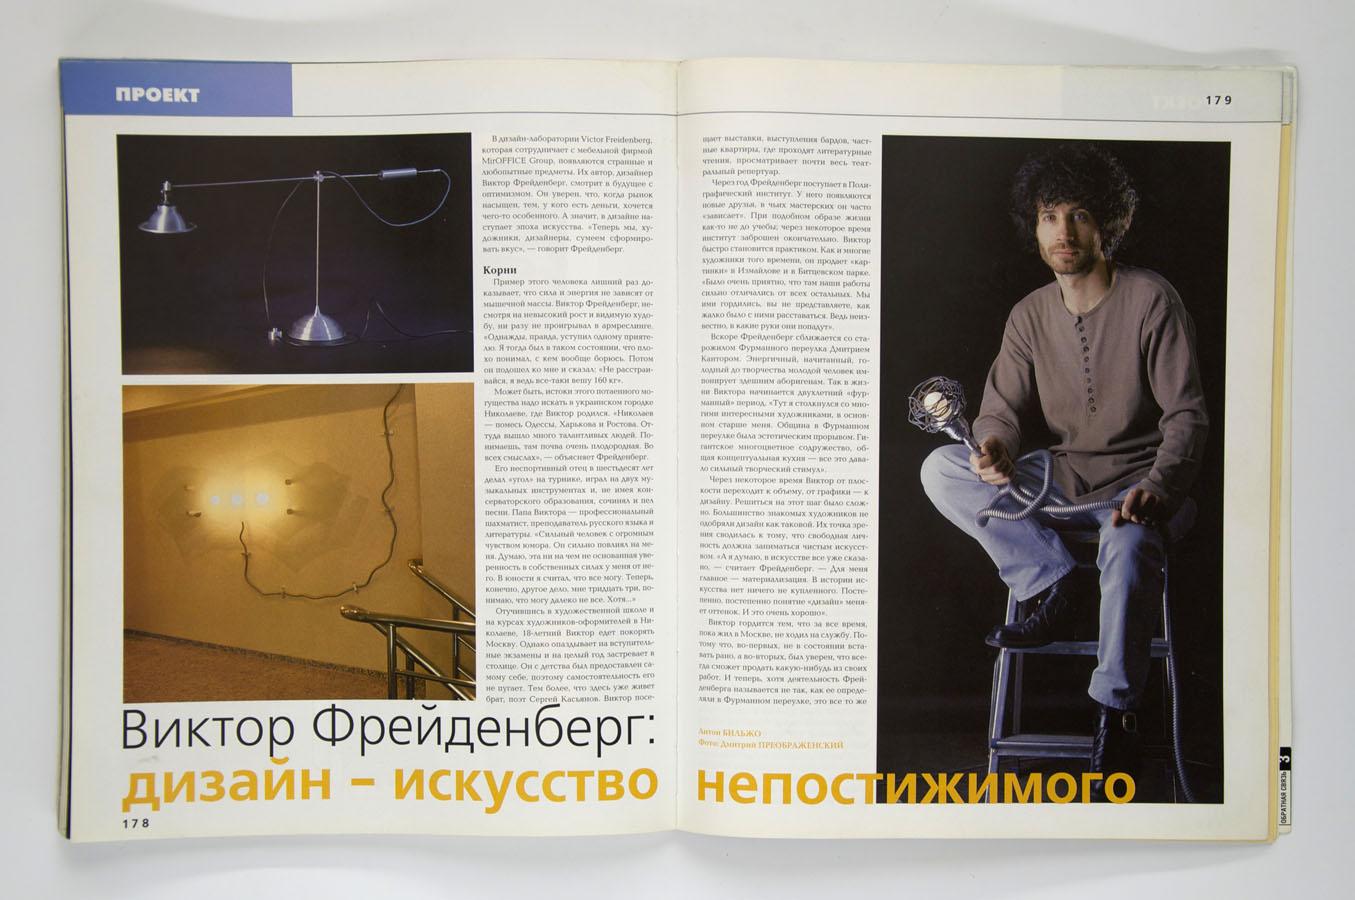 Freydenberg_Publication_113.jpg